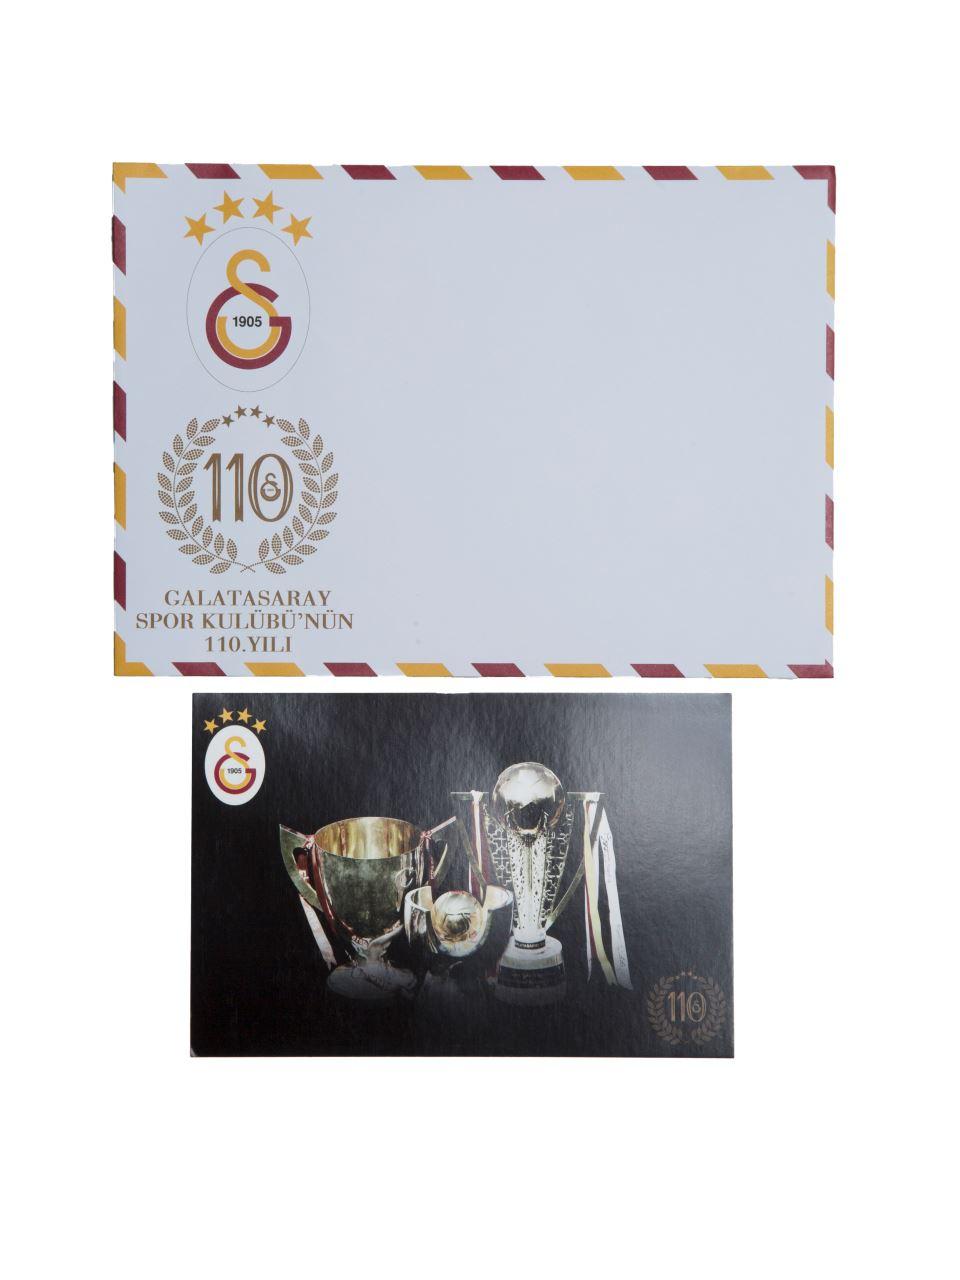 U23046 Galatasaray Spor Kulübü 110.Yıl/Pullu